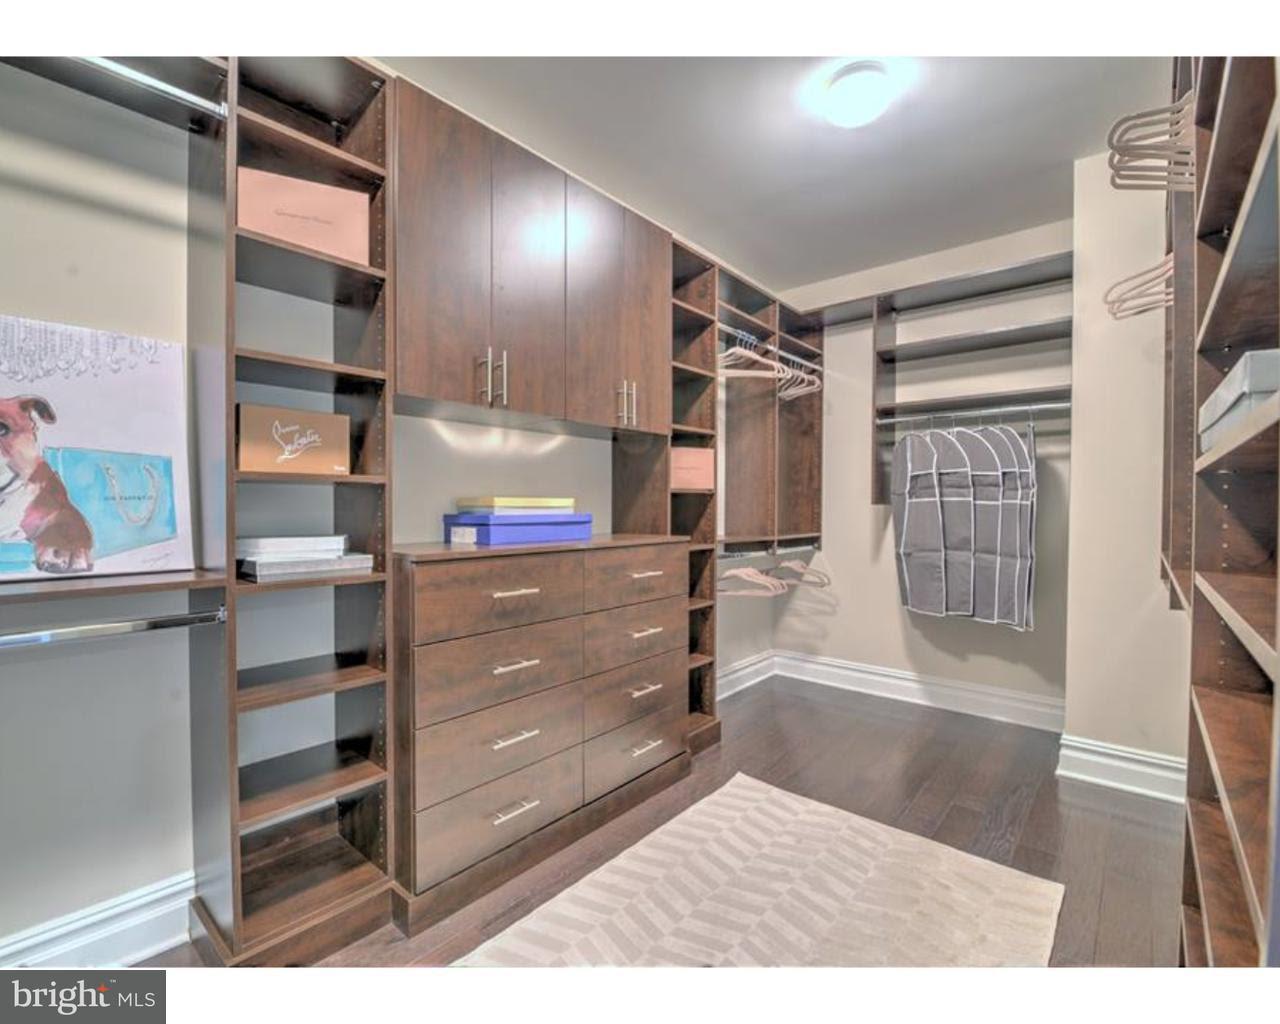 31 Hamilton Drive Cranbury New Jersey 08512 Villa For Sales